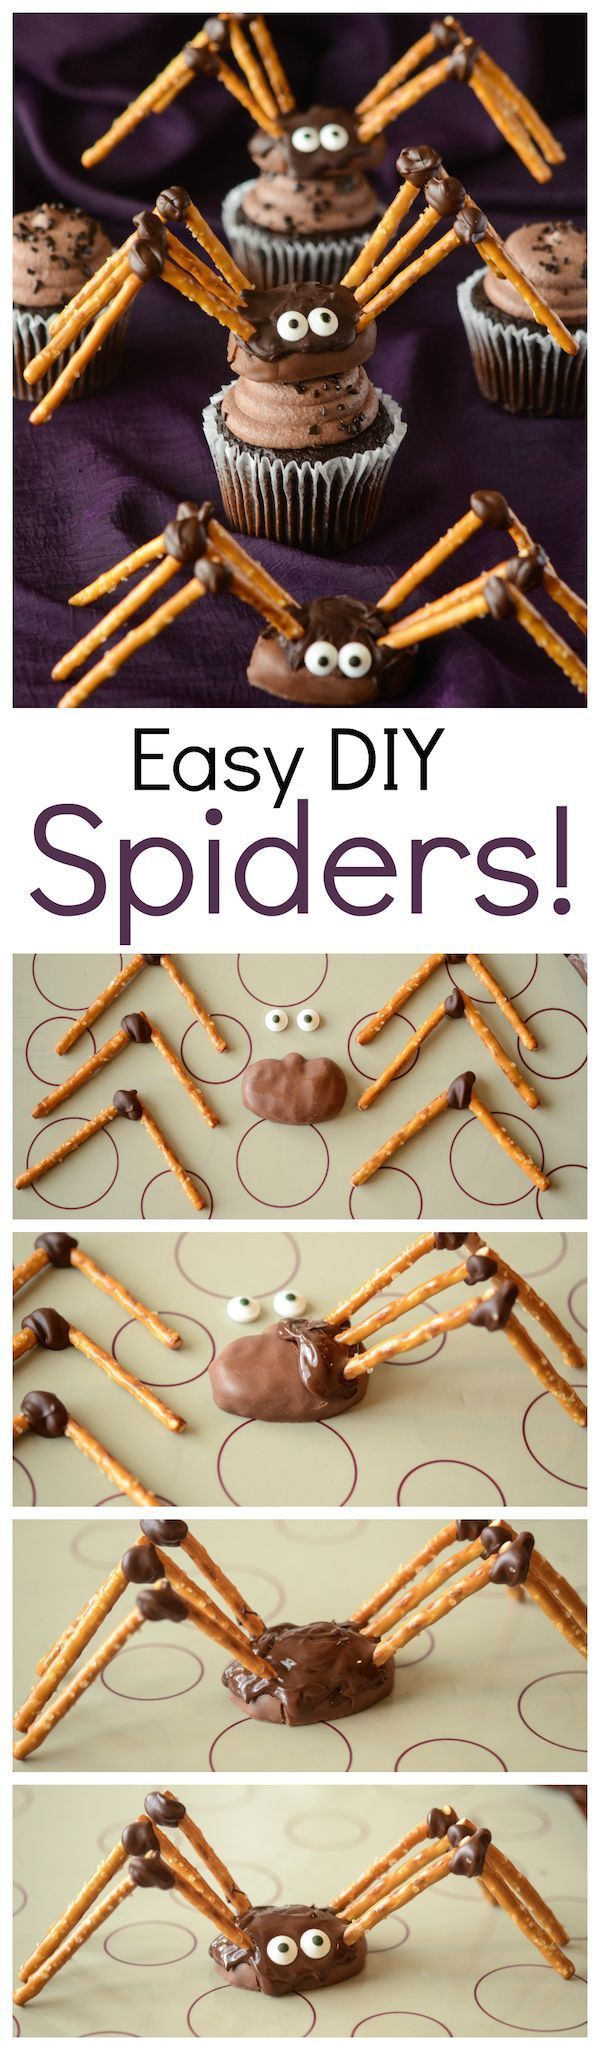 diy pretzel chocolate spiders - Halloween Chocolate Spiders